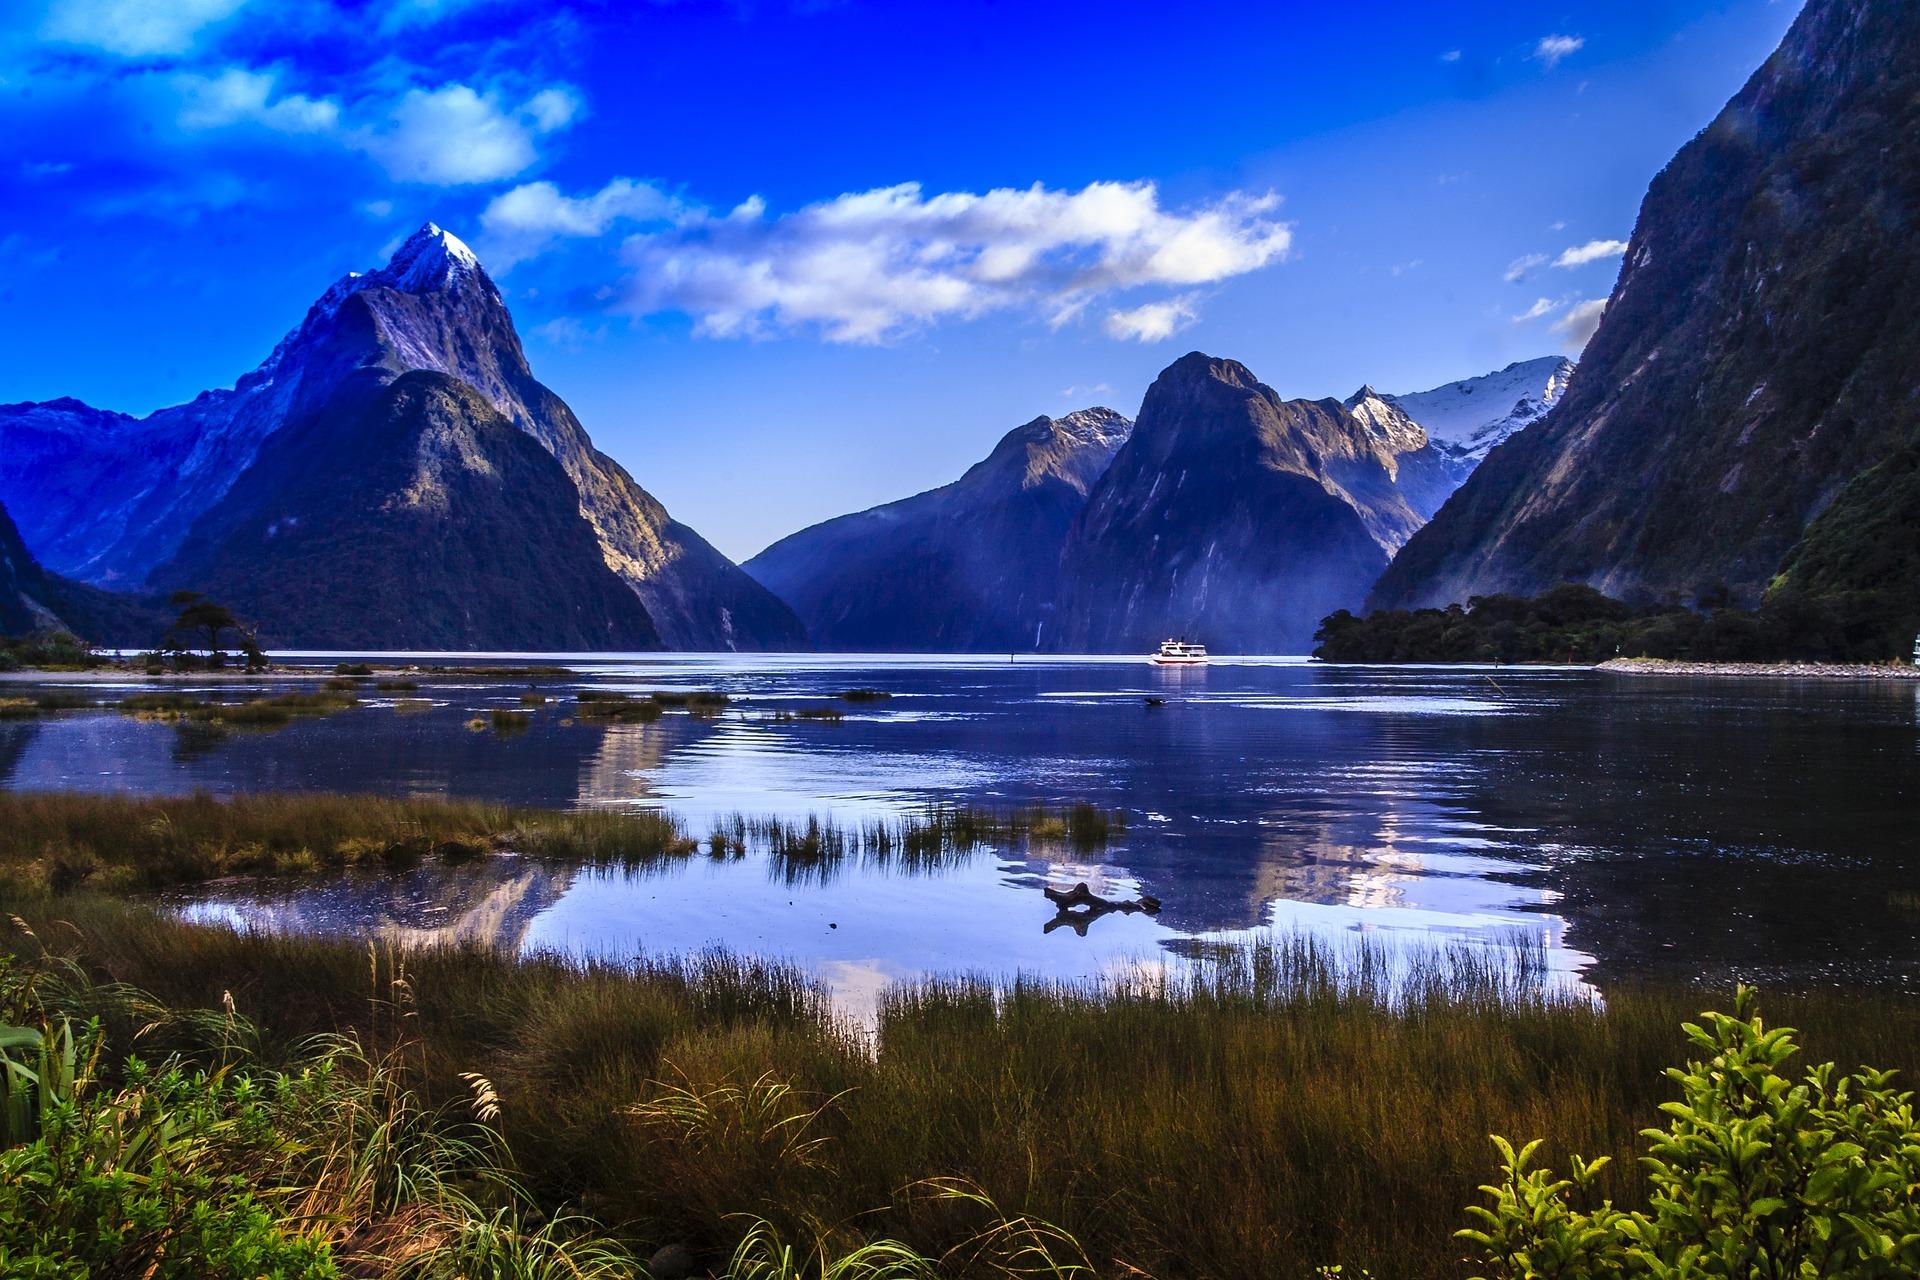 Honeymoon New Zealand - WeddingsAbroad.com